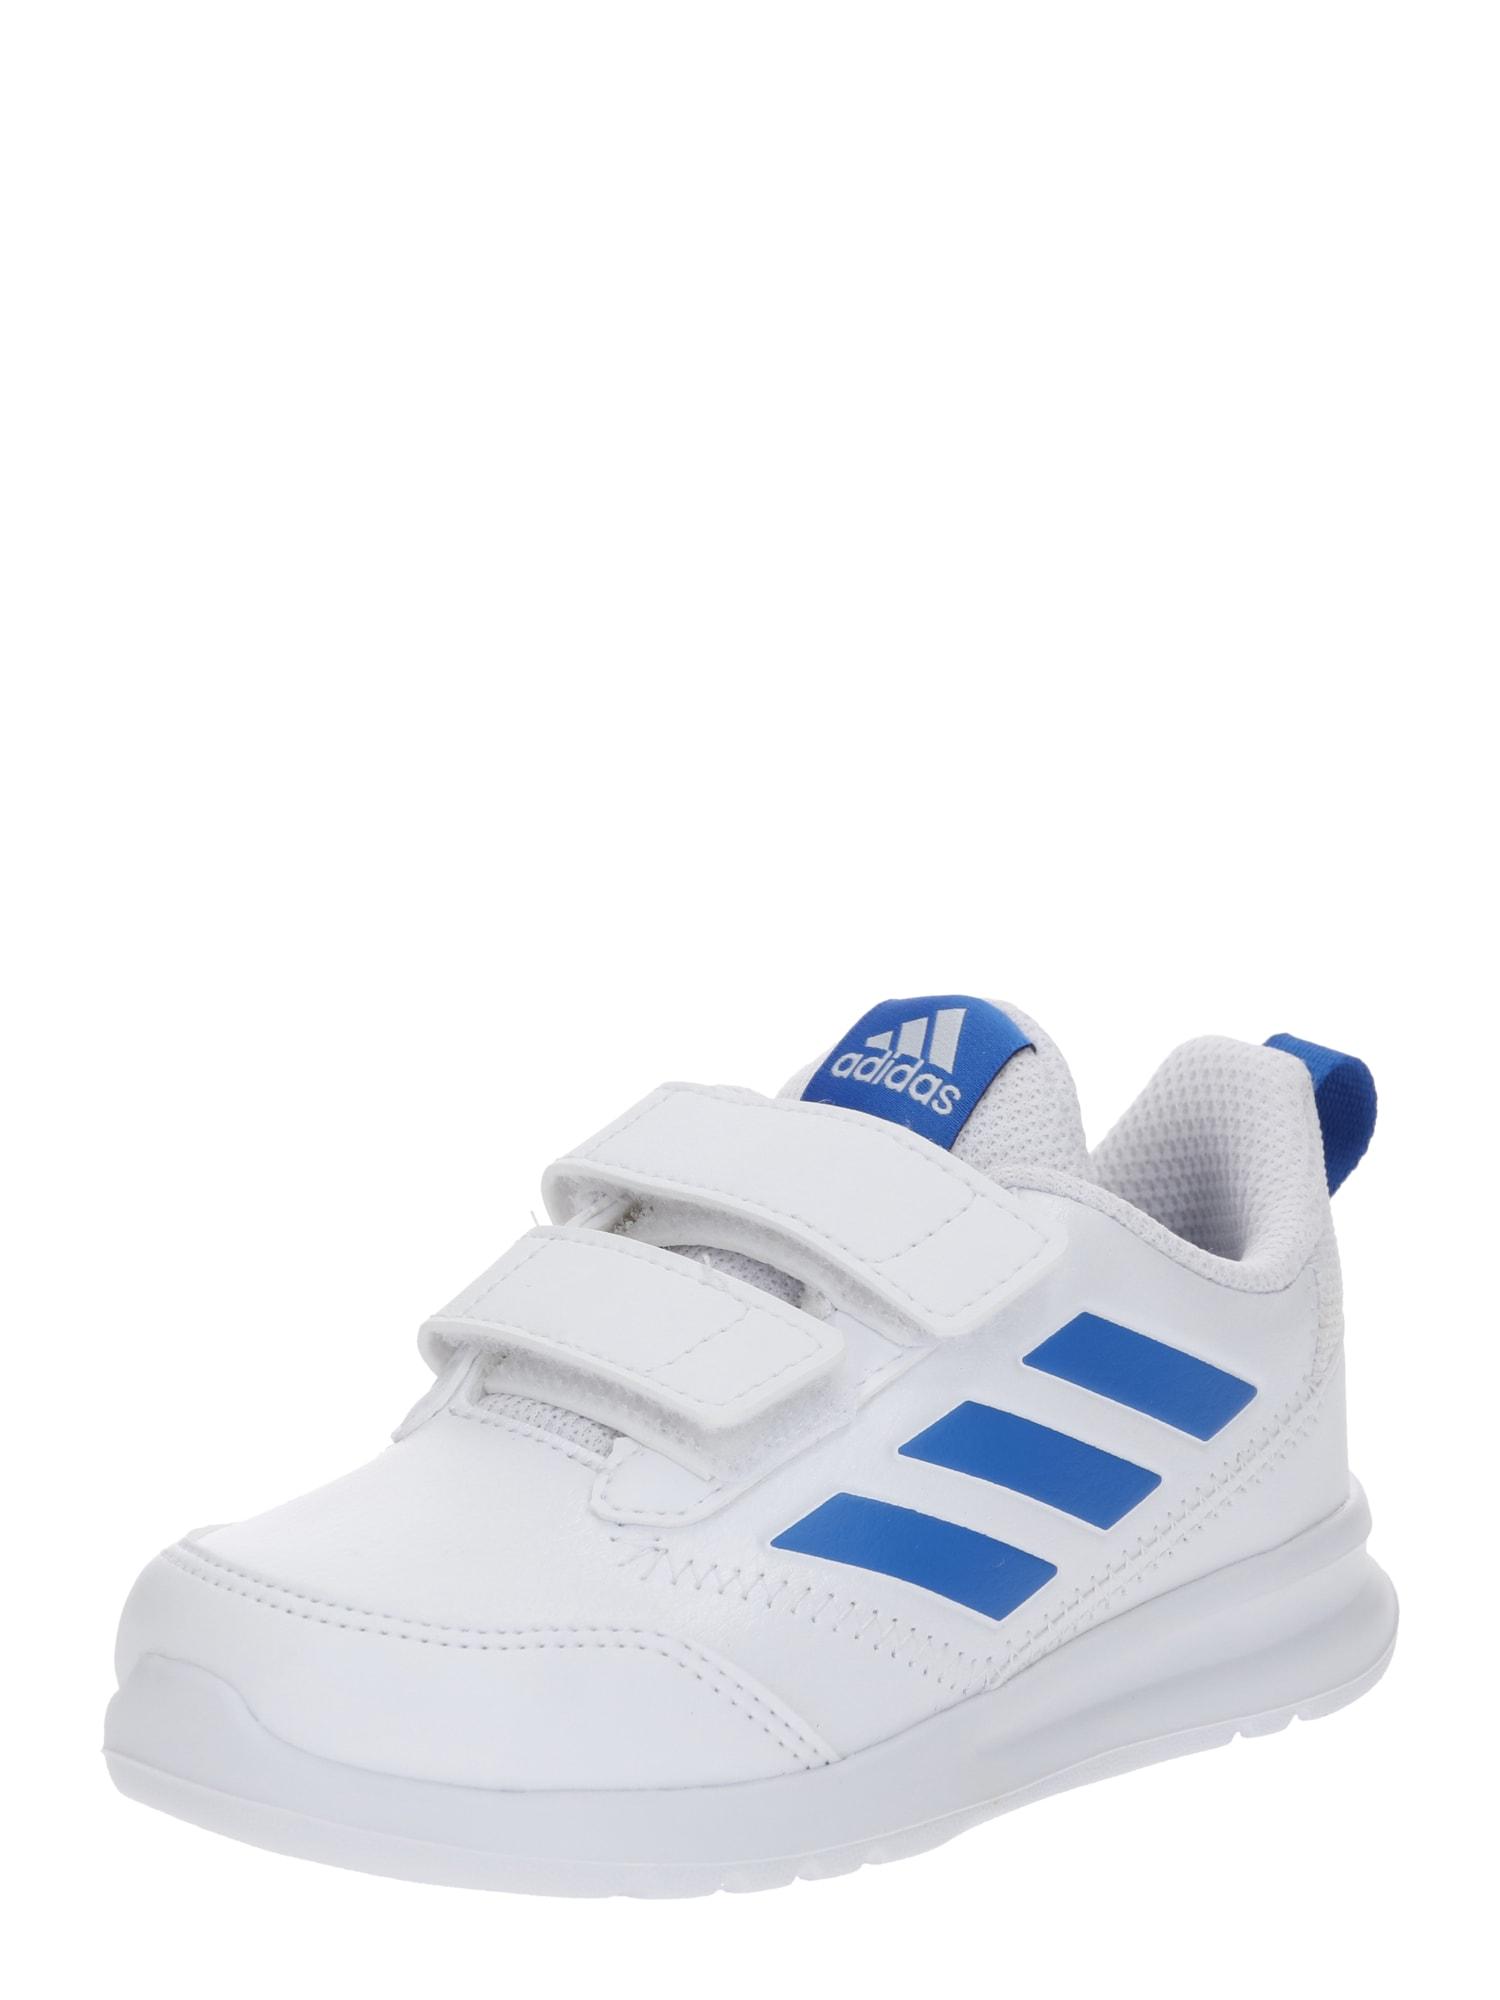 Sportovní boty AltaRun CF I modrá bílá ADIDAS PERFORMANCE